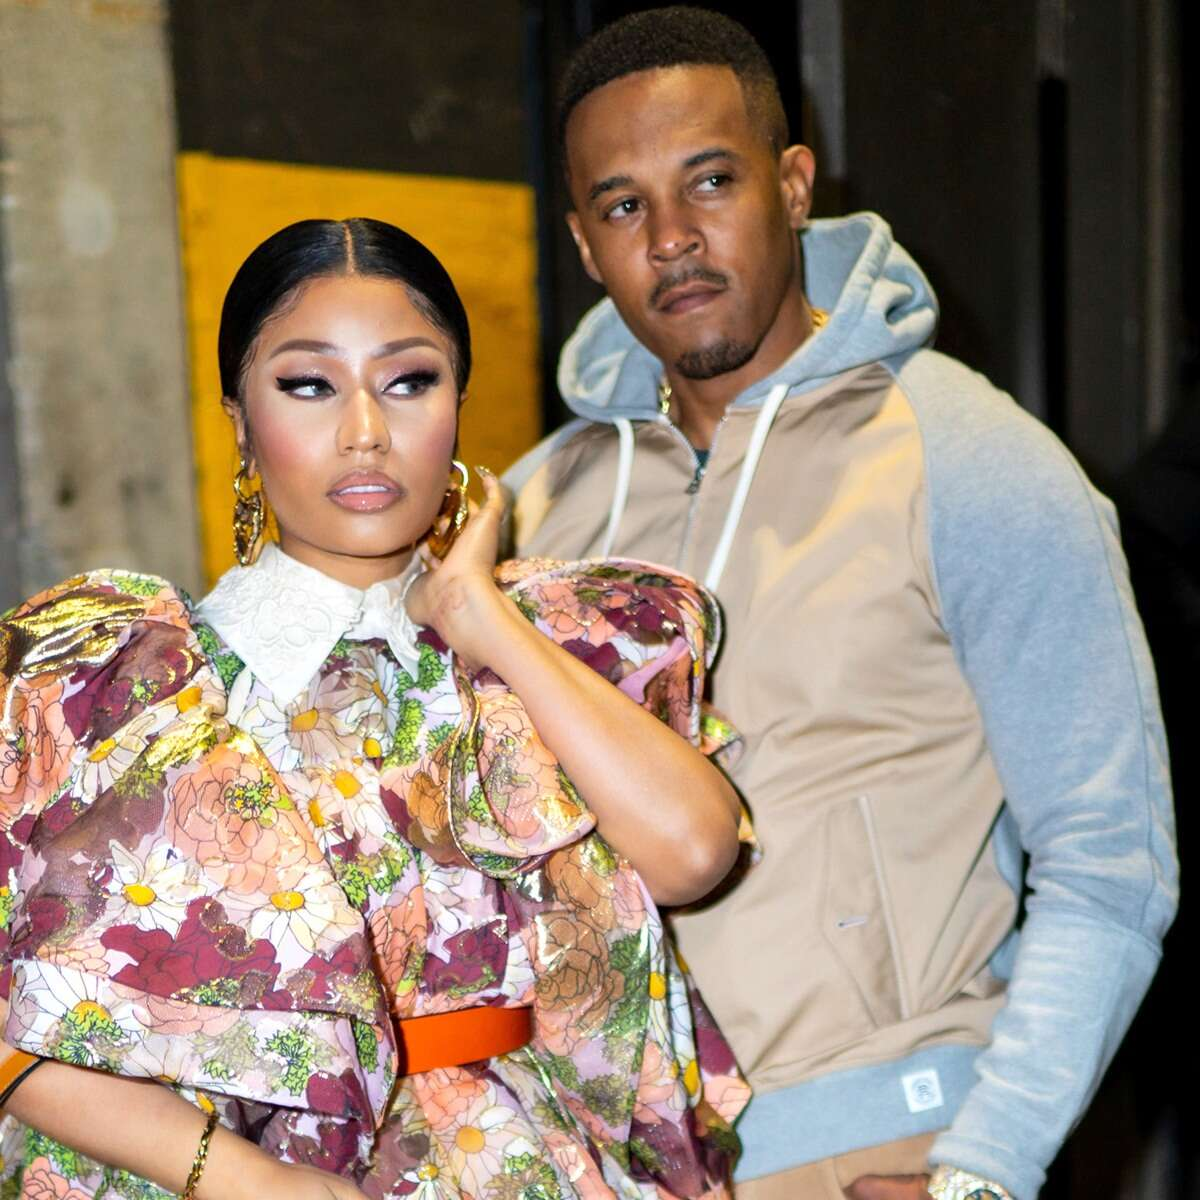 Kenneth Petty Devient Une Star Grâce À Nicki Minaj